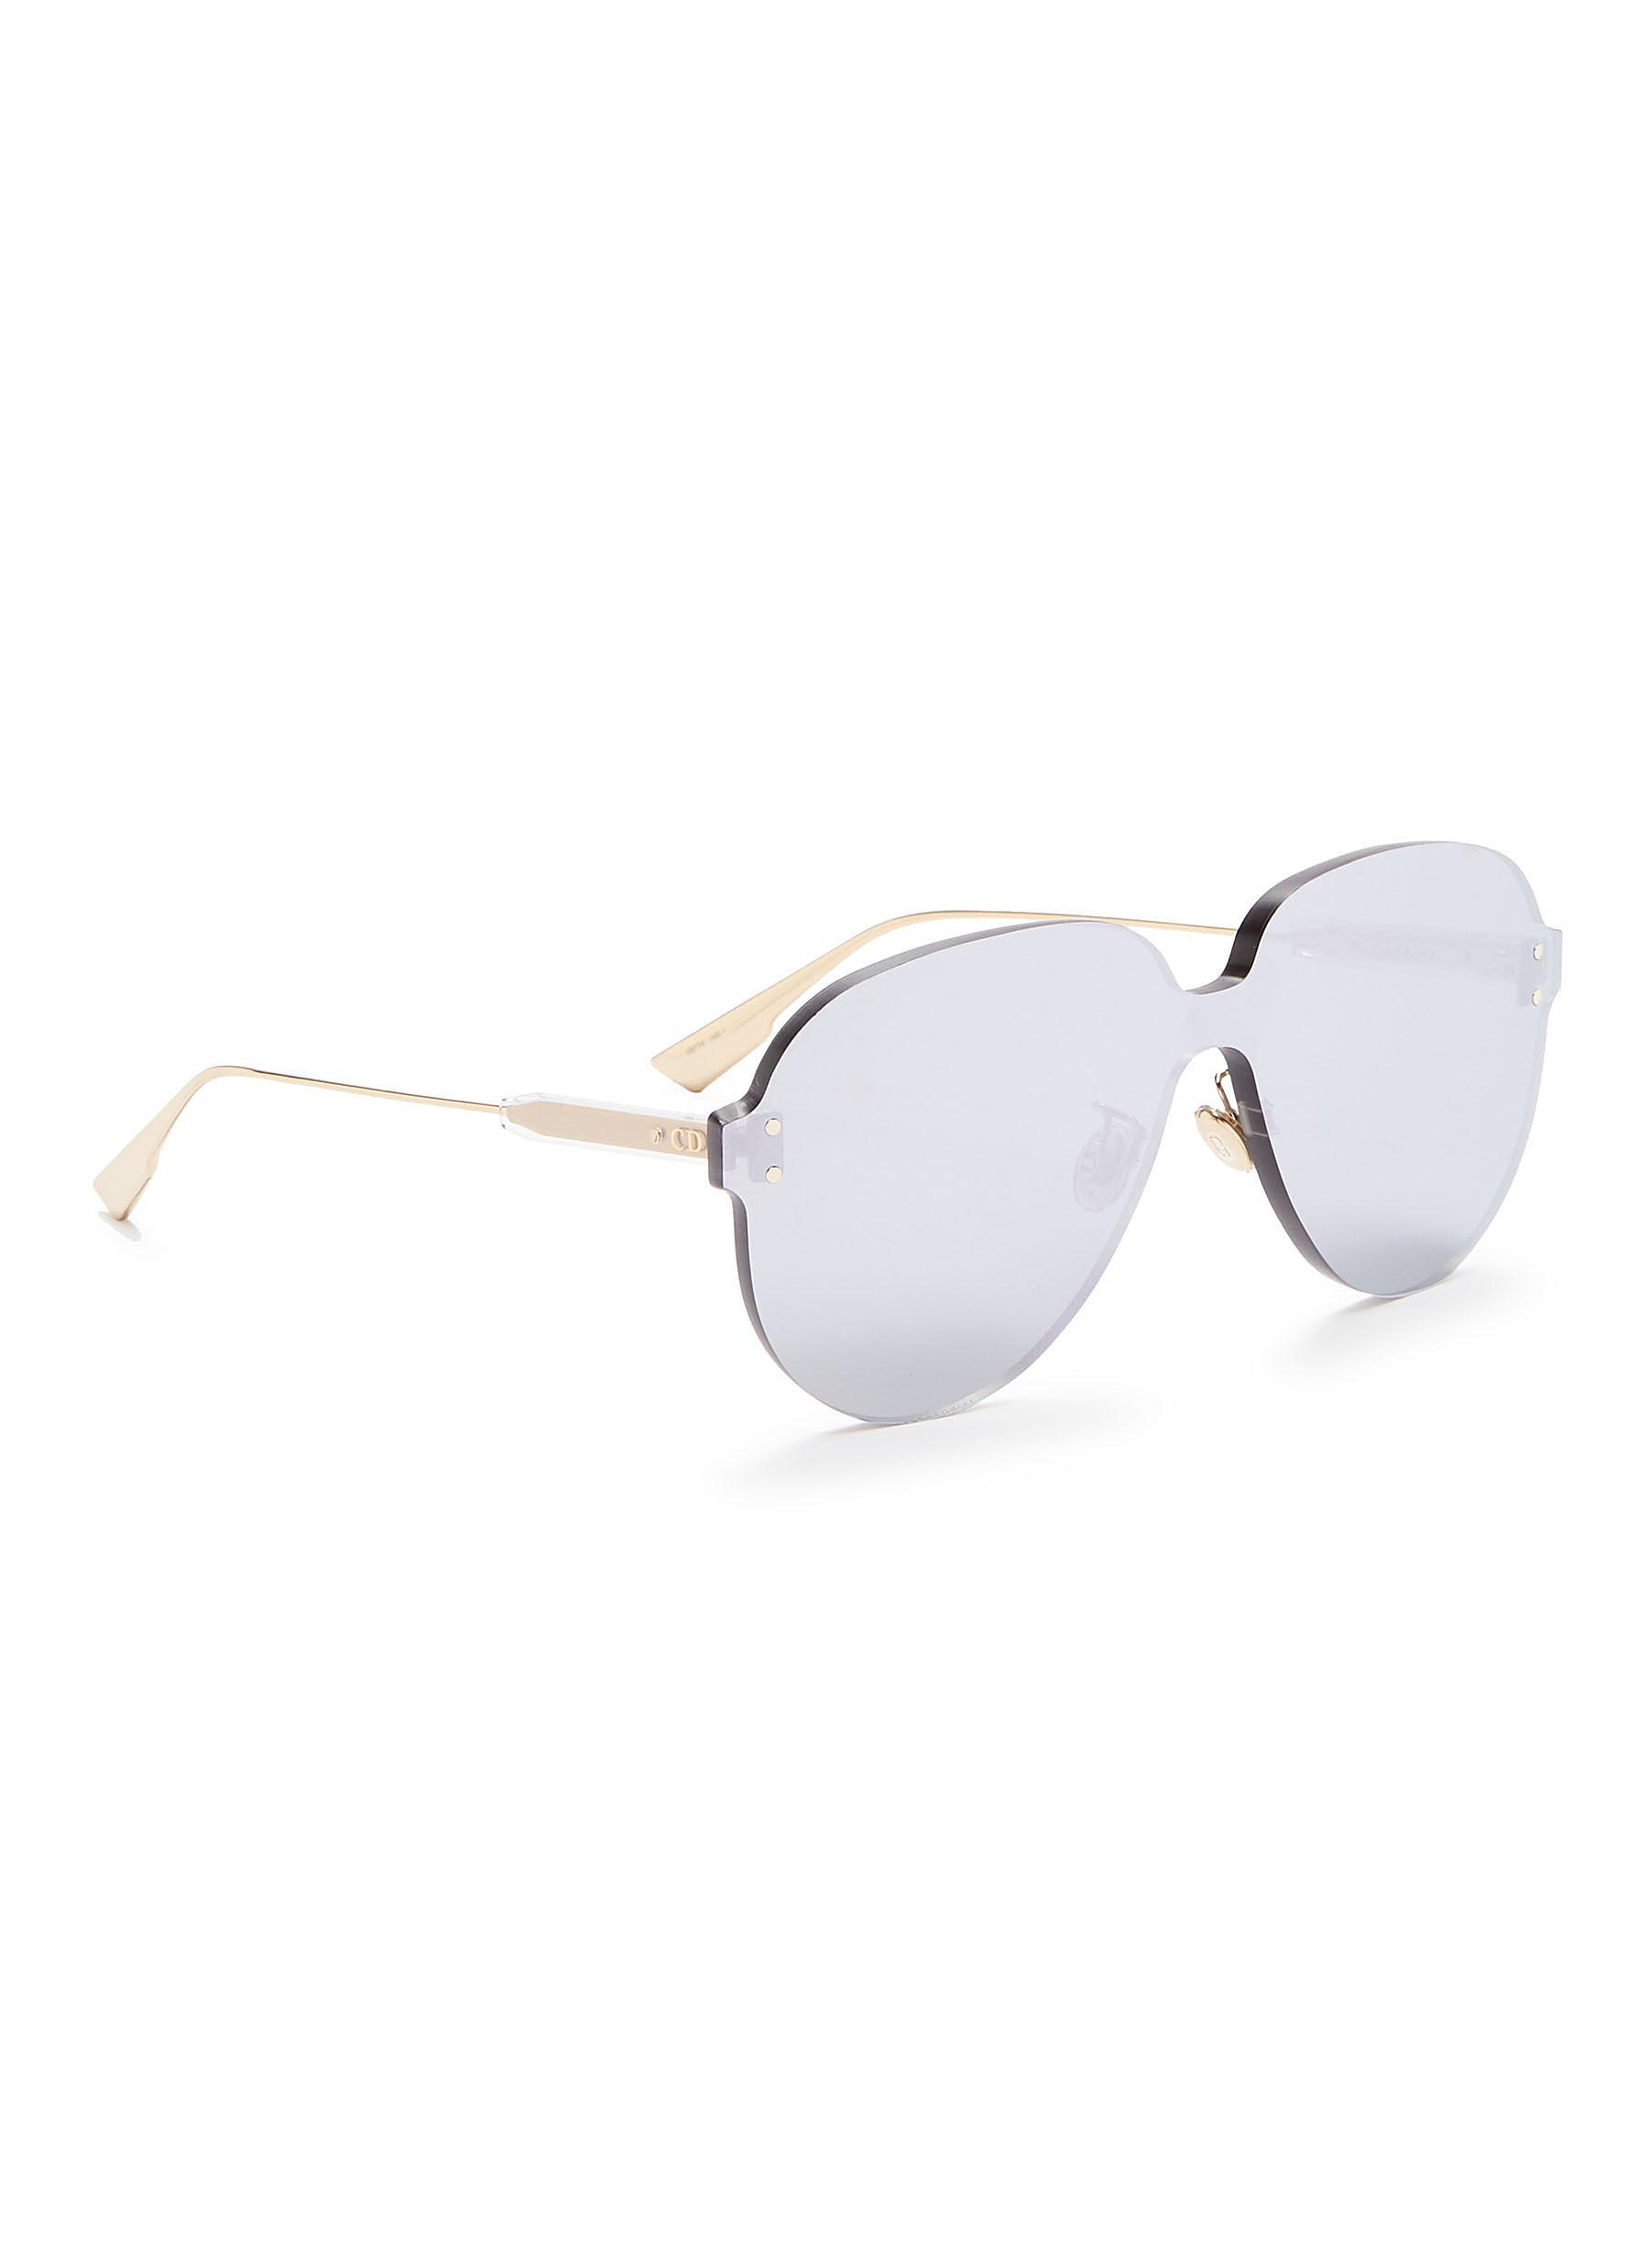 82da1fedb9b Lyst - Dior   Color Quake 3  Rimless Aviator Sunglasses in Metallic